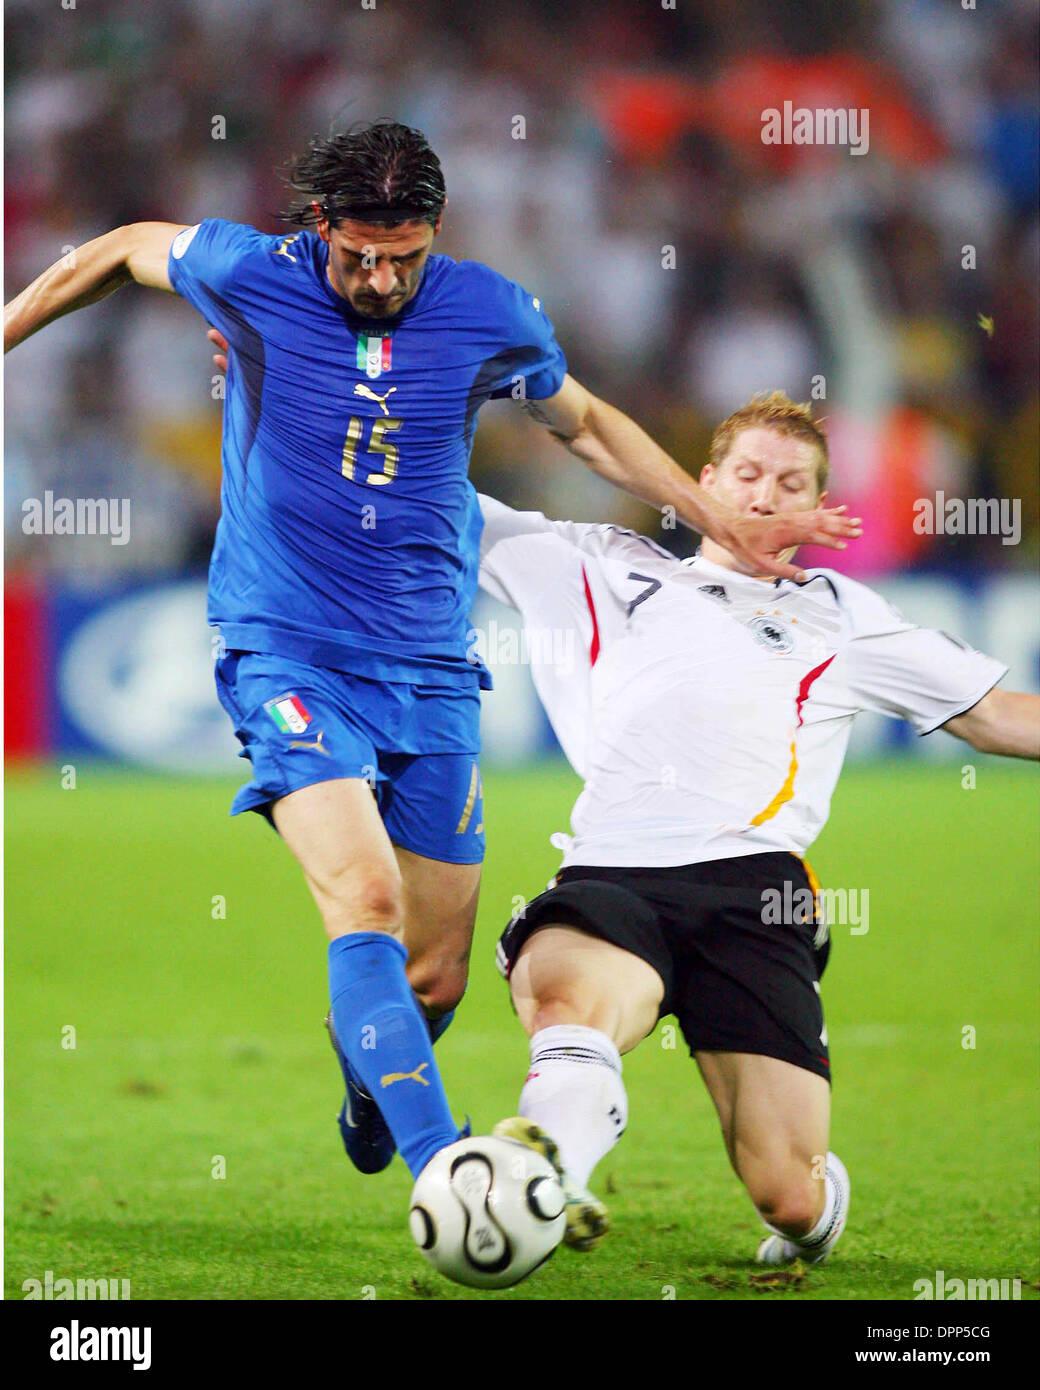 Julio 4, 2006 - Dortmund, Alemania - BASTIAN SCHWEINSTEIGER & VINCENZO IAQUINTA.challenge.Alemania contra Italia..SCHWEINSTEIGER Foto de stock